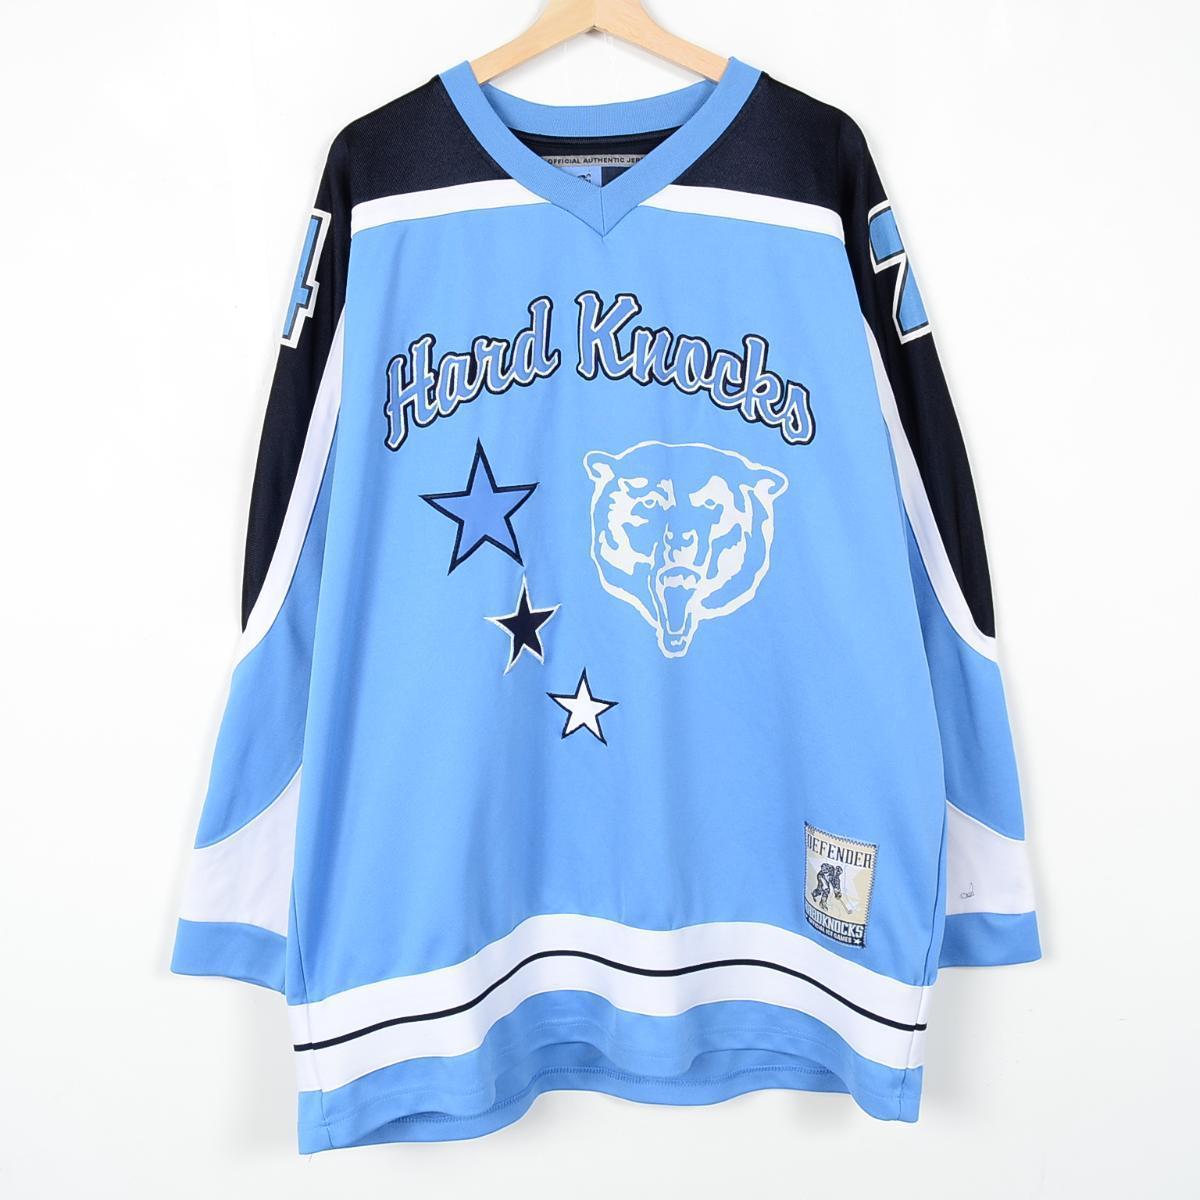 SOHK SCHOOL OF HARD KNOCKS曲棍球衬衫人XL HKA/wep2992 160618